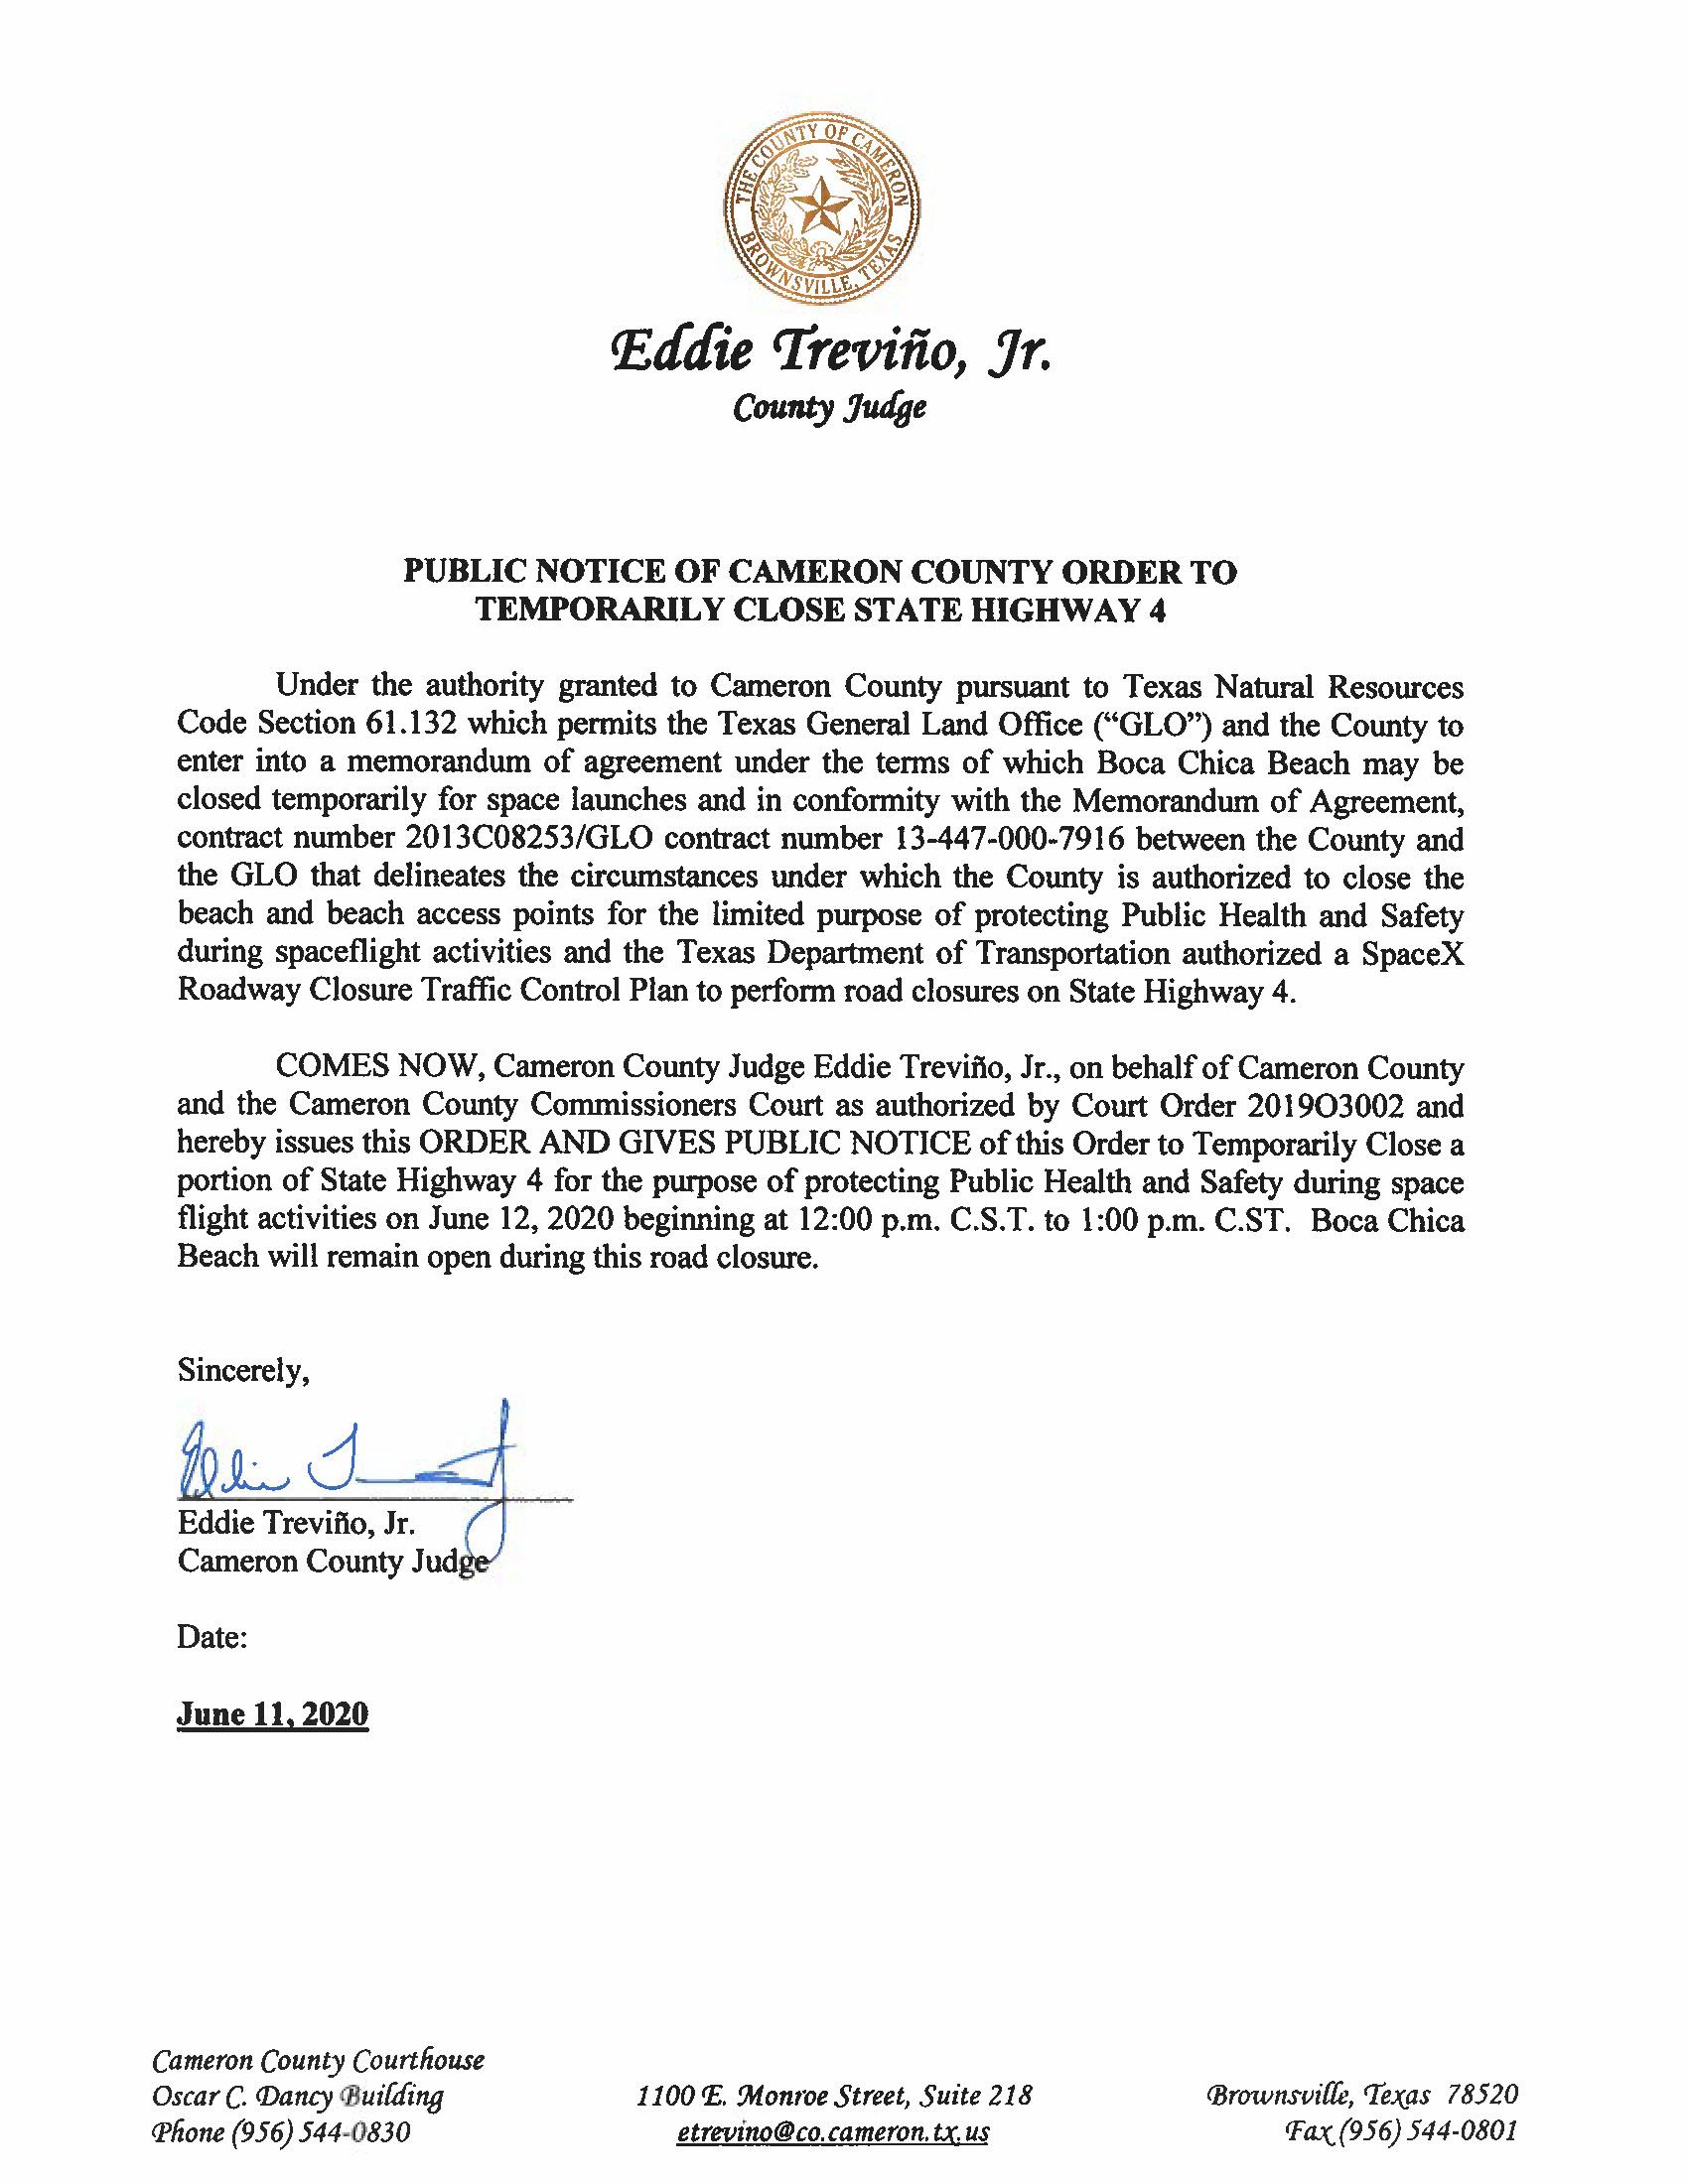 PUBLIC NOTICE OF CAMERON COUNTY ORDER TO TEMP. ROAD CLOSURE. 06.12.20